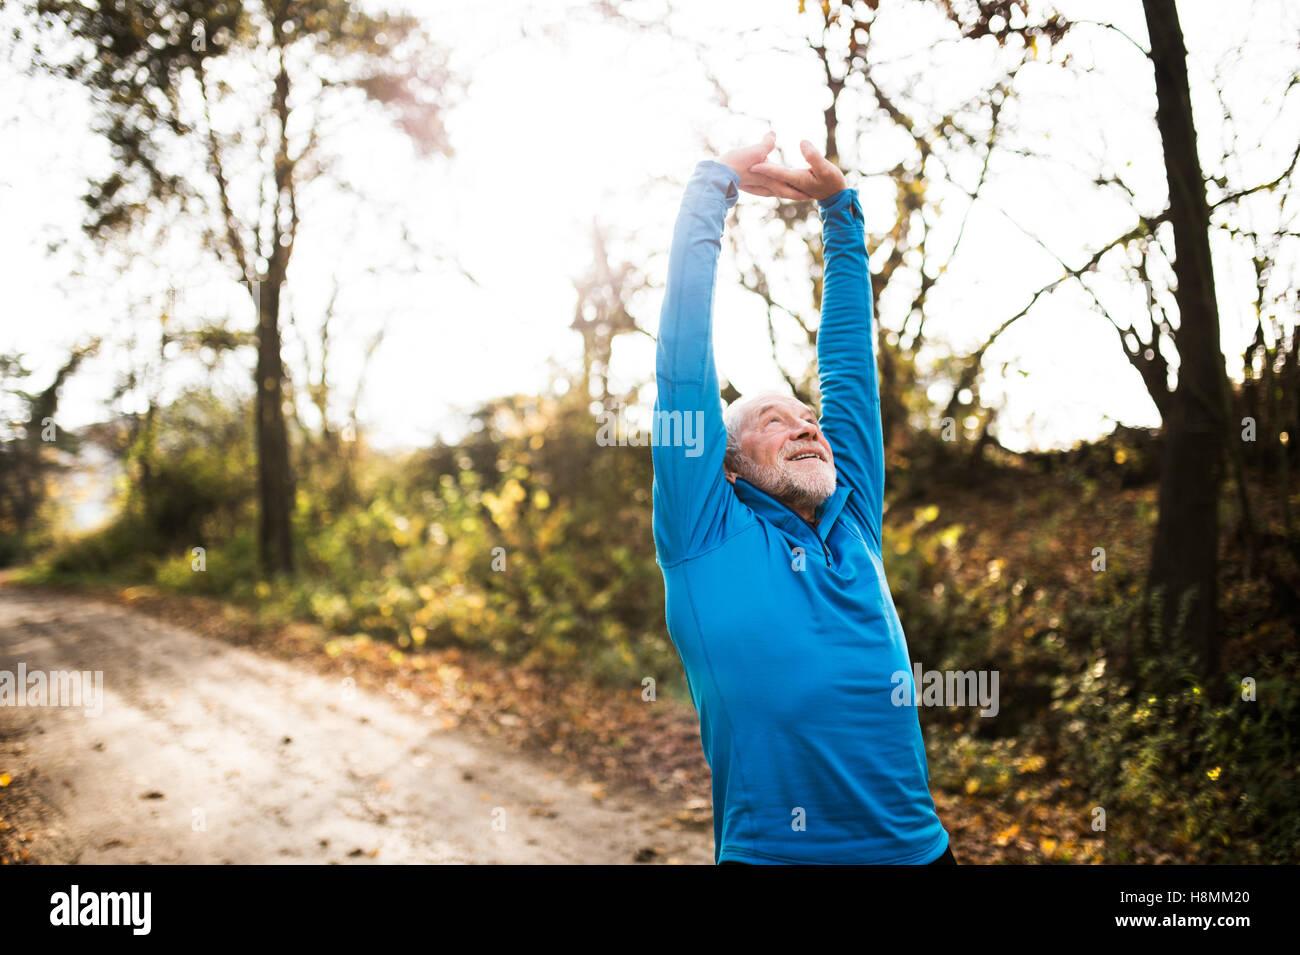 Senior runner facendo stretching nella soleggiata la natura in autunno. Immagini Stock